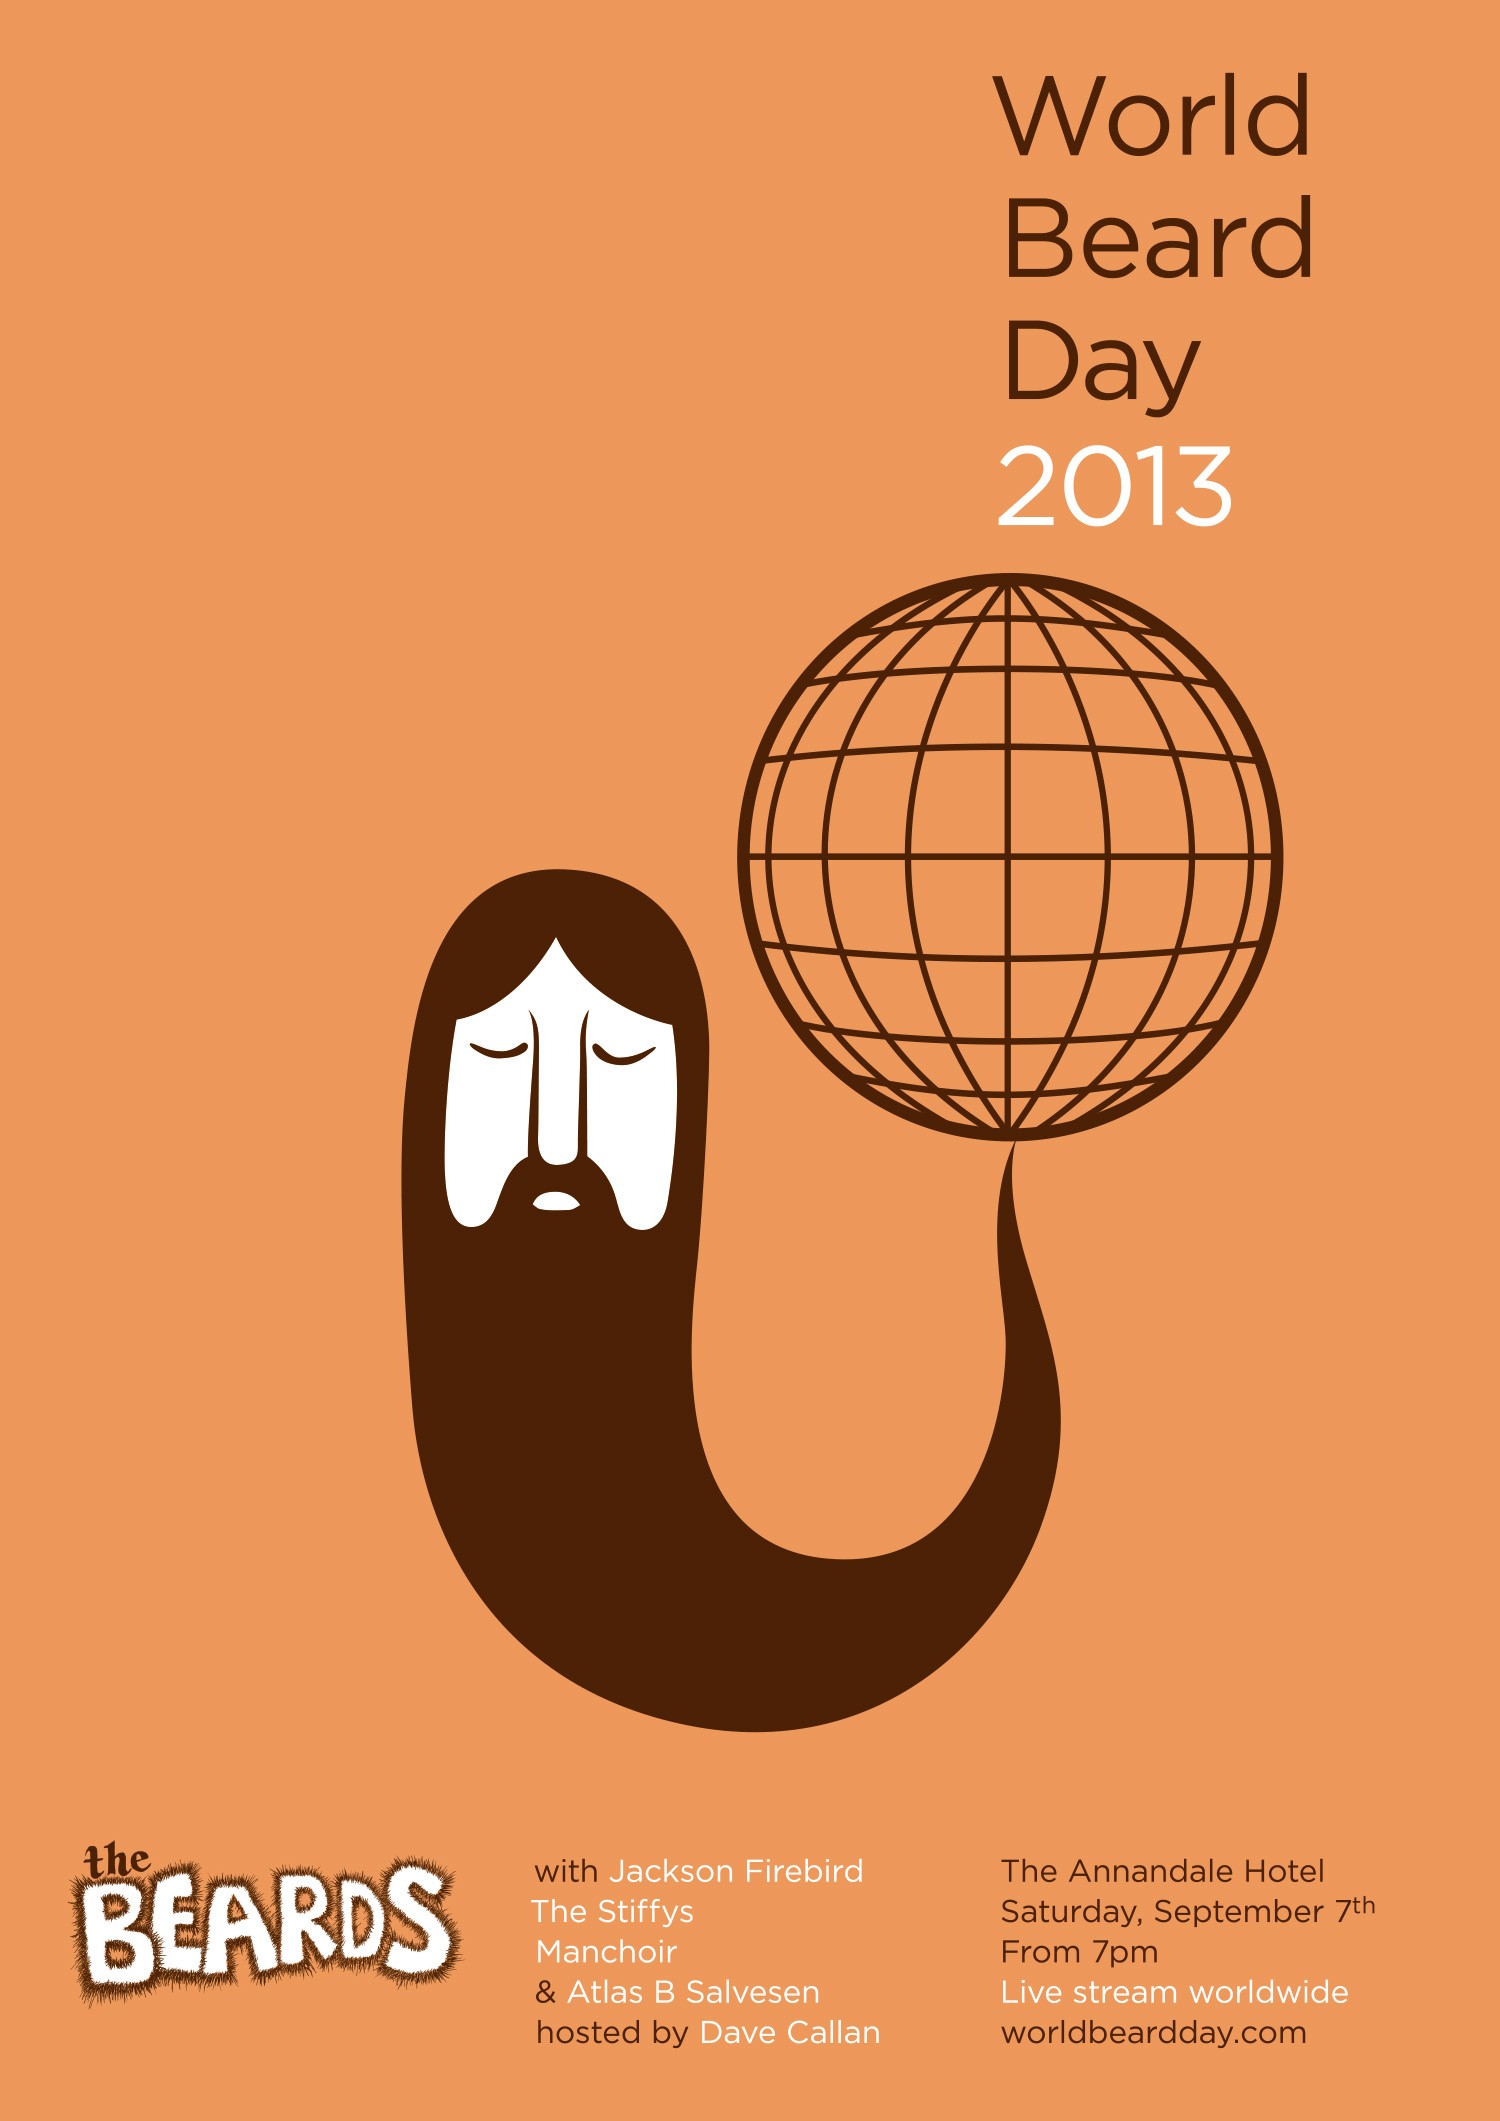 world-beard-day-poster-the-beards.jpg